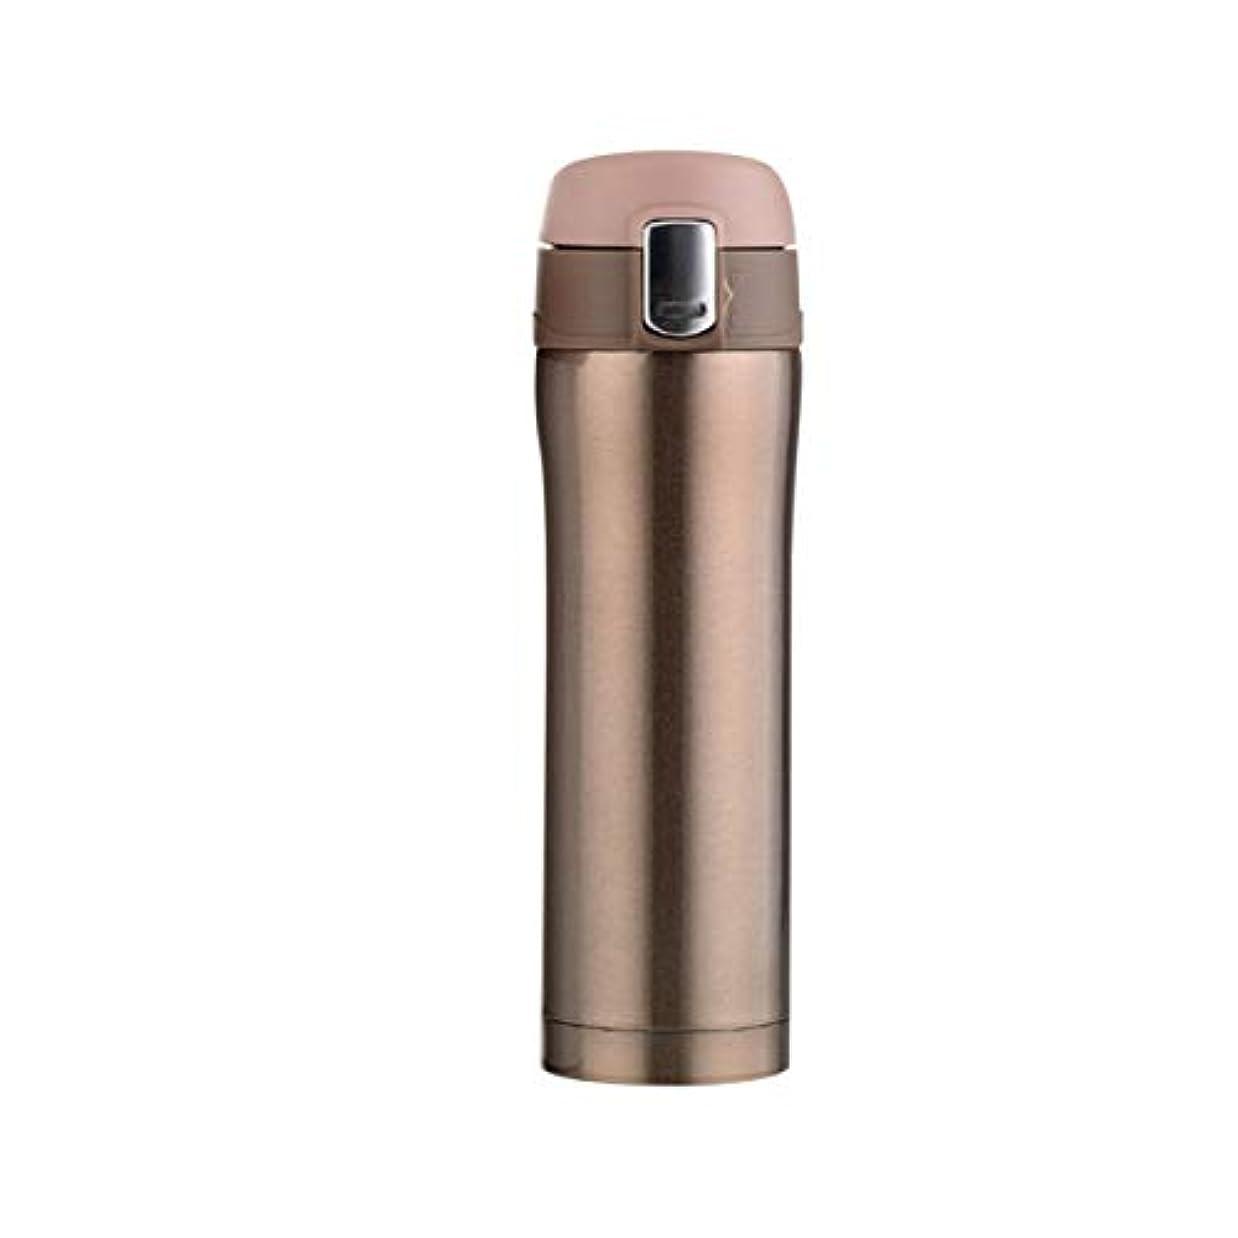 Saikogoods 500MLコンパクトサイズのステンレス鋼真空断熱ウォーターボトルメンズ?レディース?オフィス旅行カー水マグボトルドリンク ゴールド